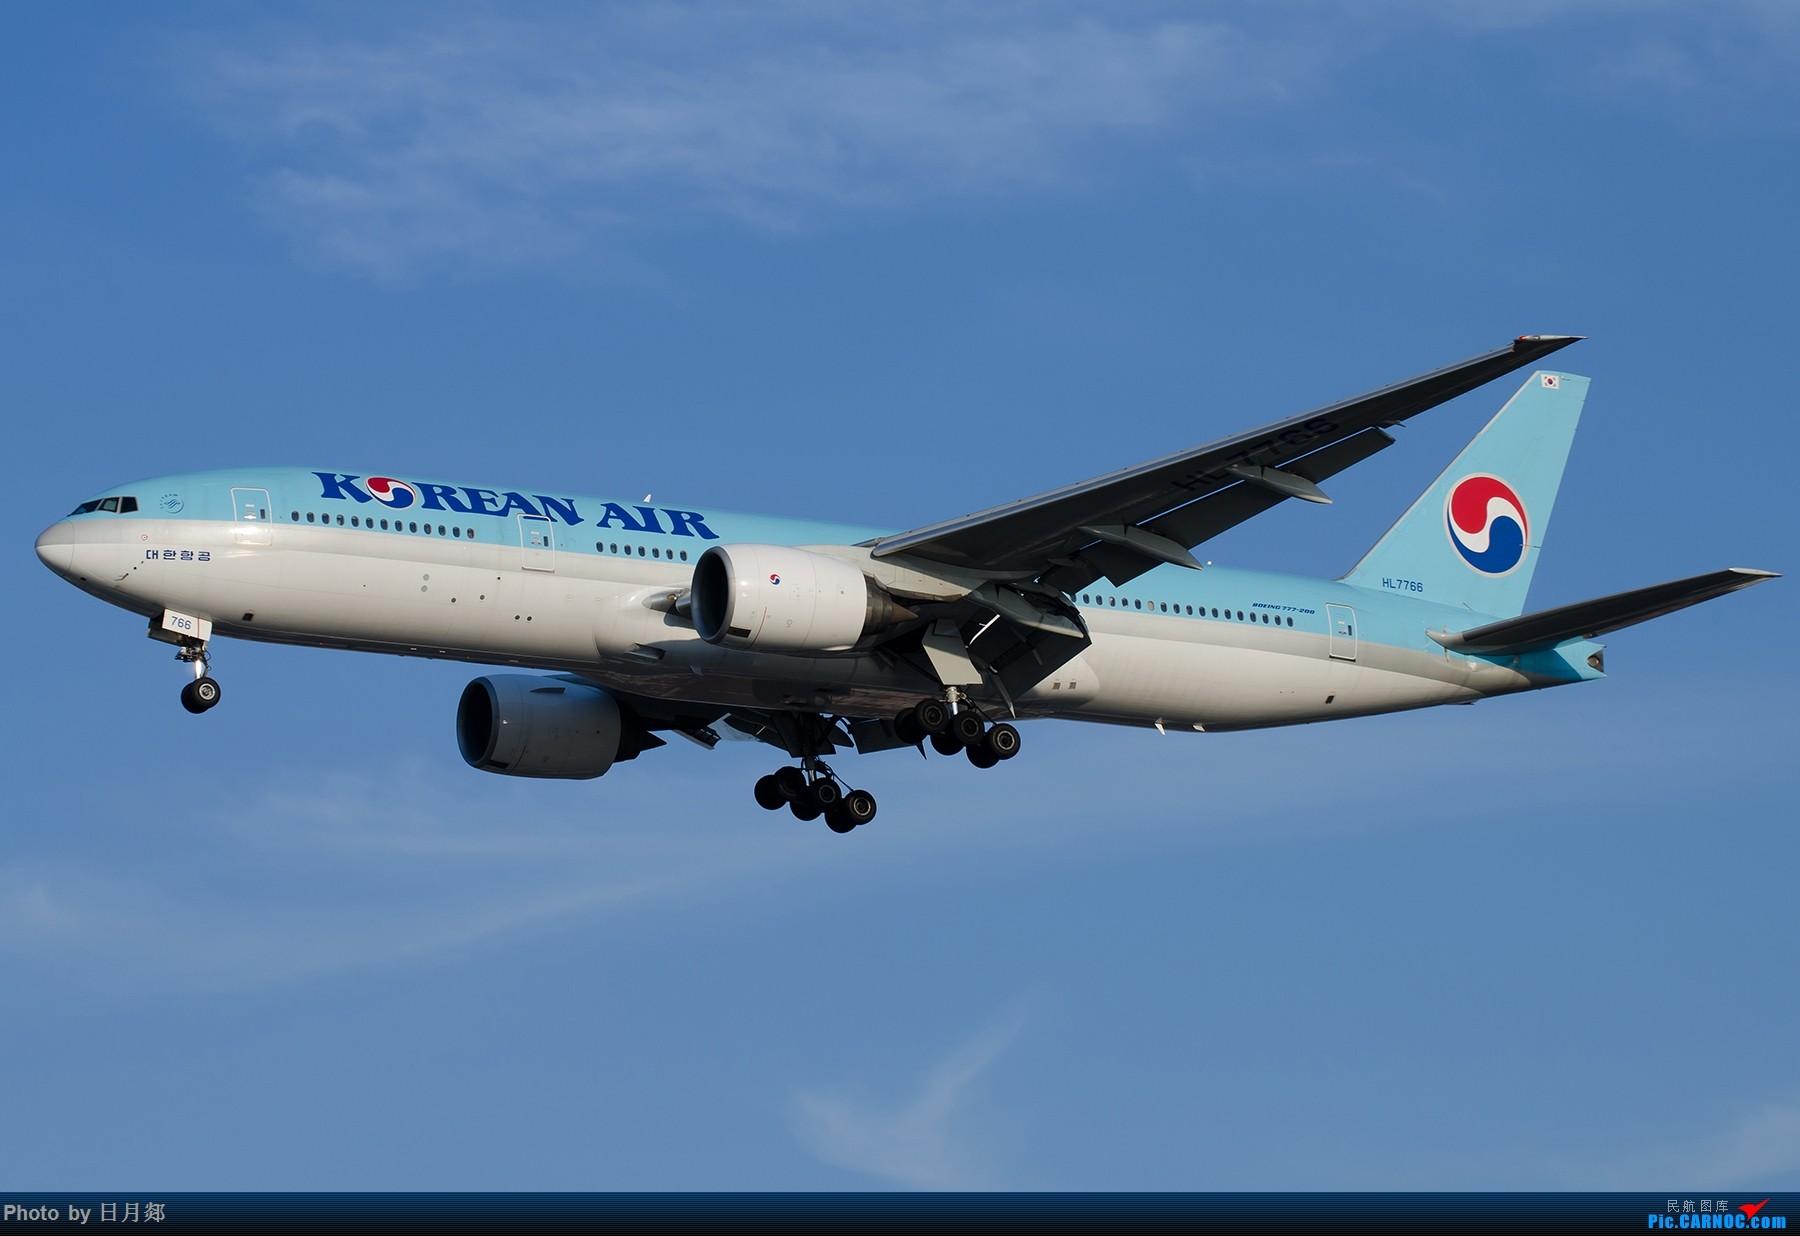 Re:[原创]【SHA拍机*1800大图】轻度污染来临前宝贵的蓝天,且拍且珍惜 BOEING 777-200 HL7786 中国上海虹桥国际机场